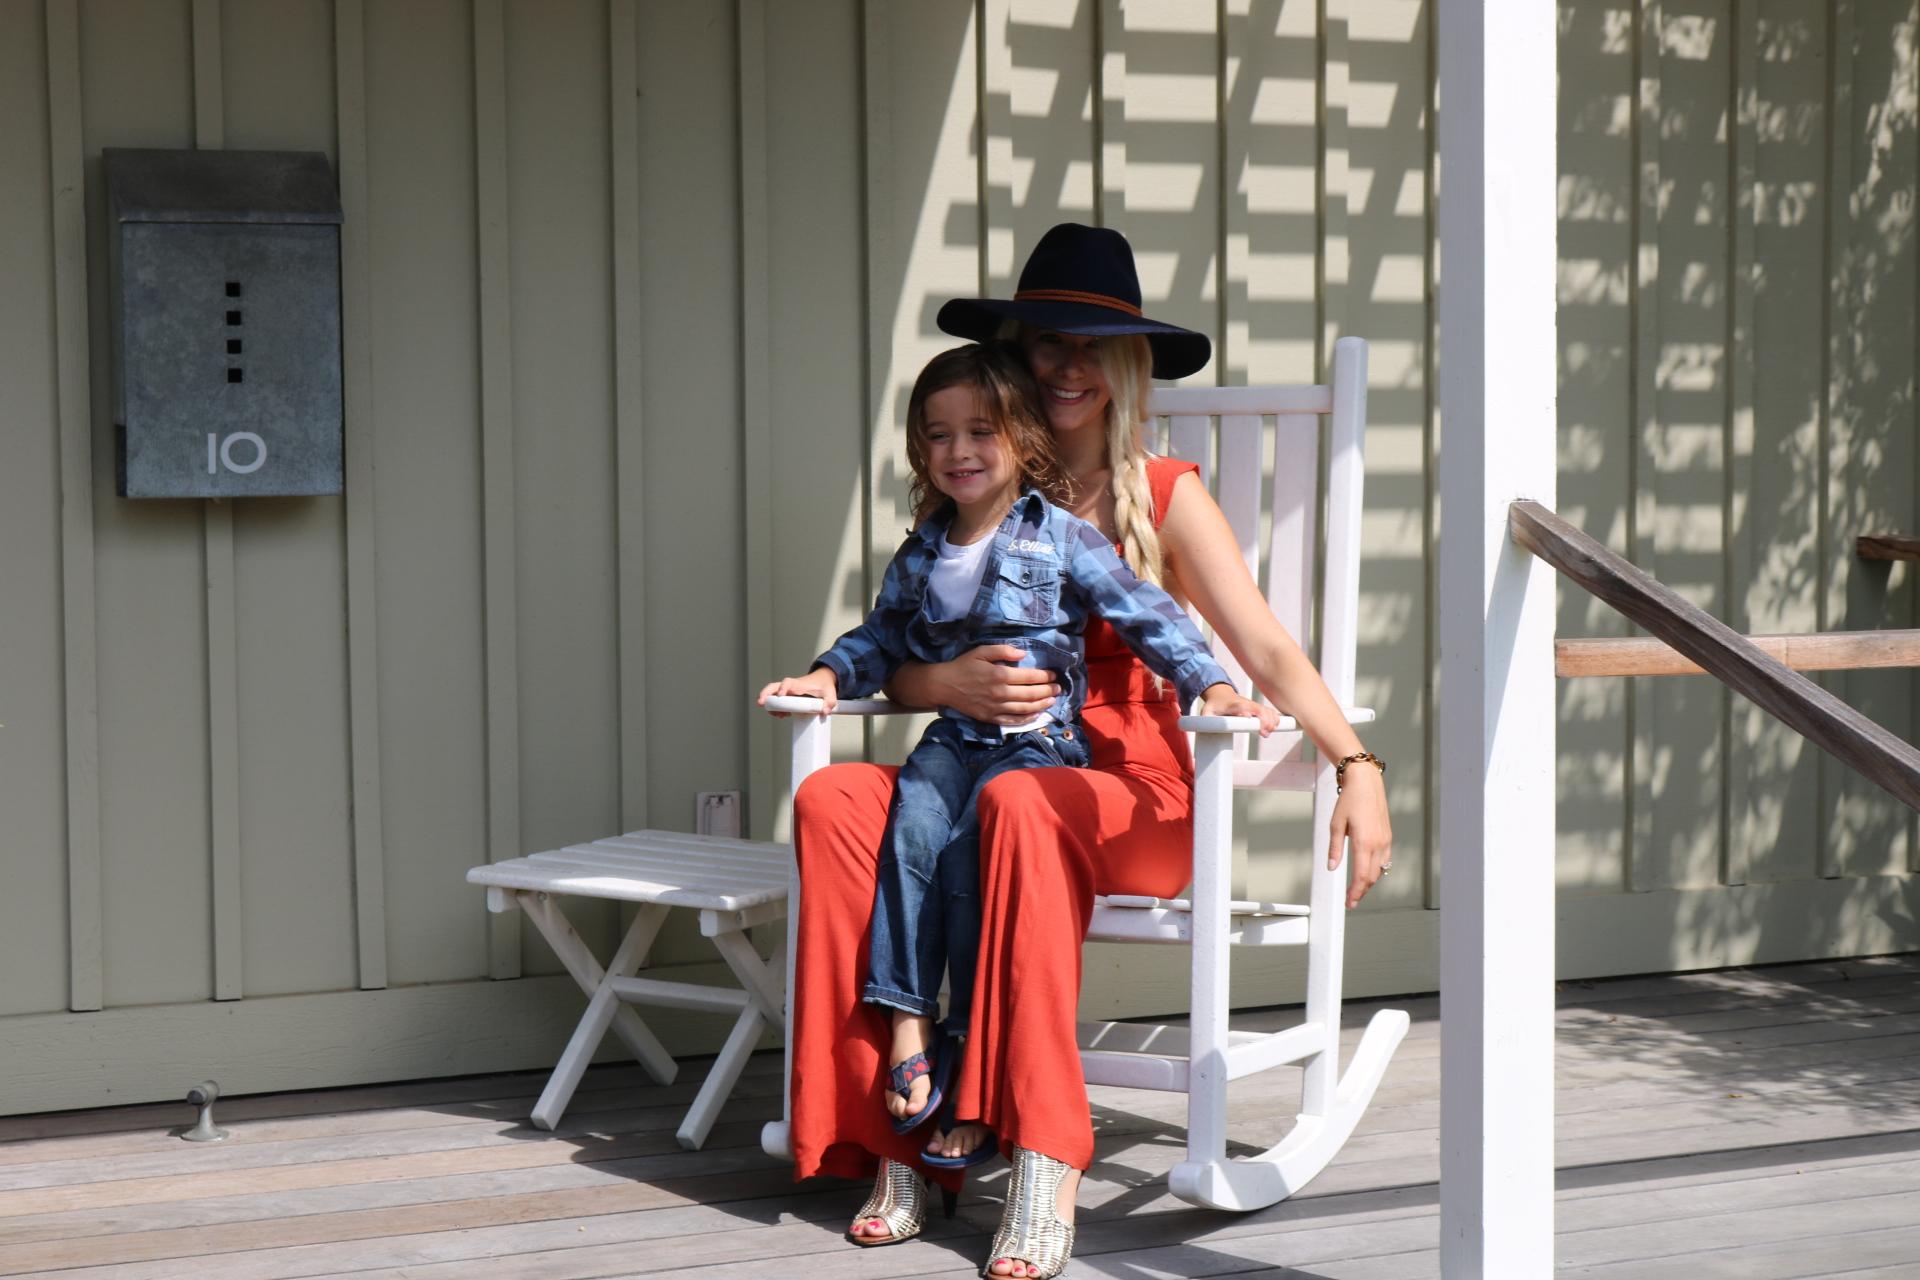 Some good porch-sitting!